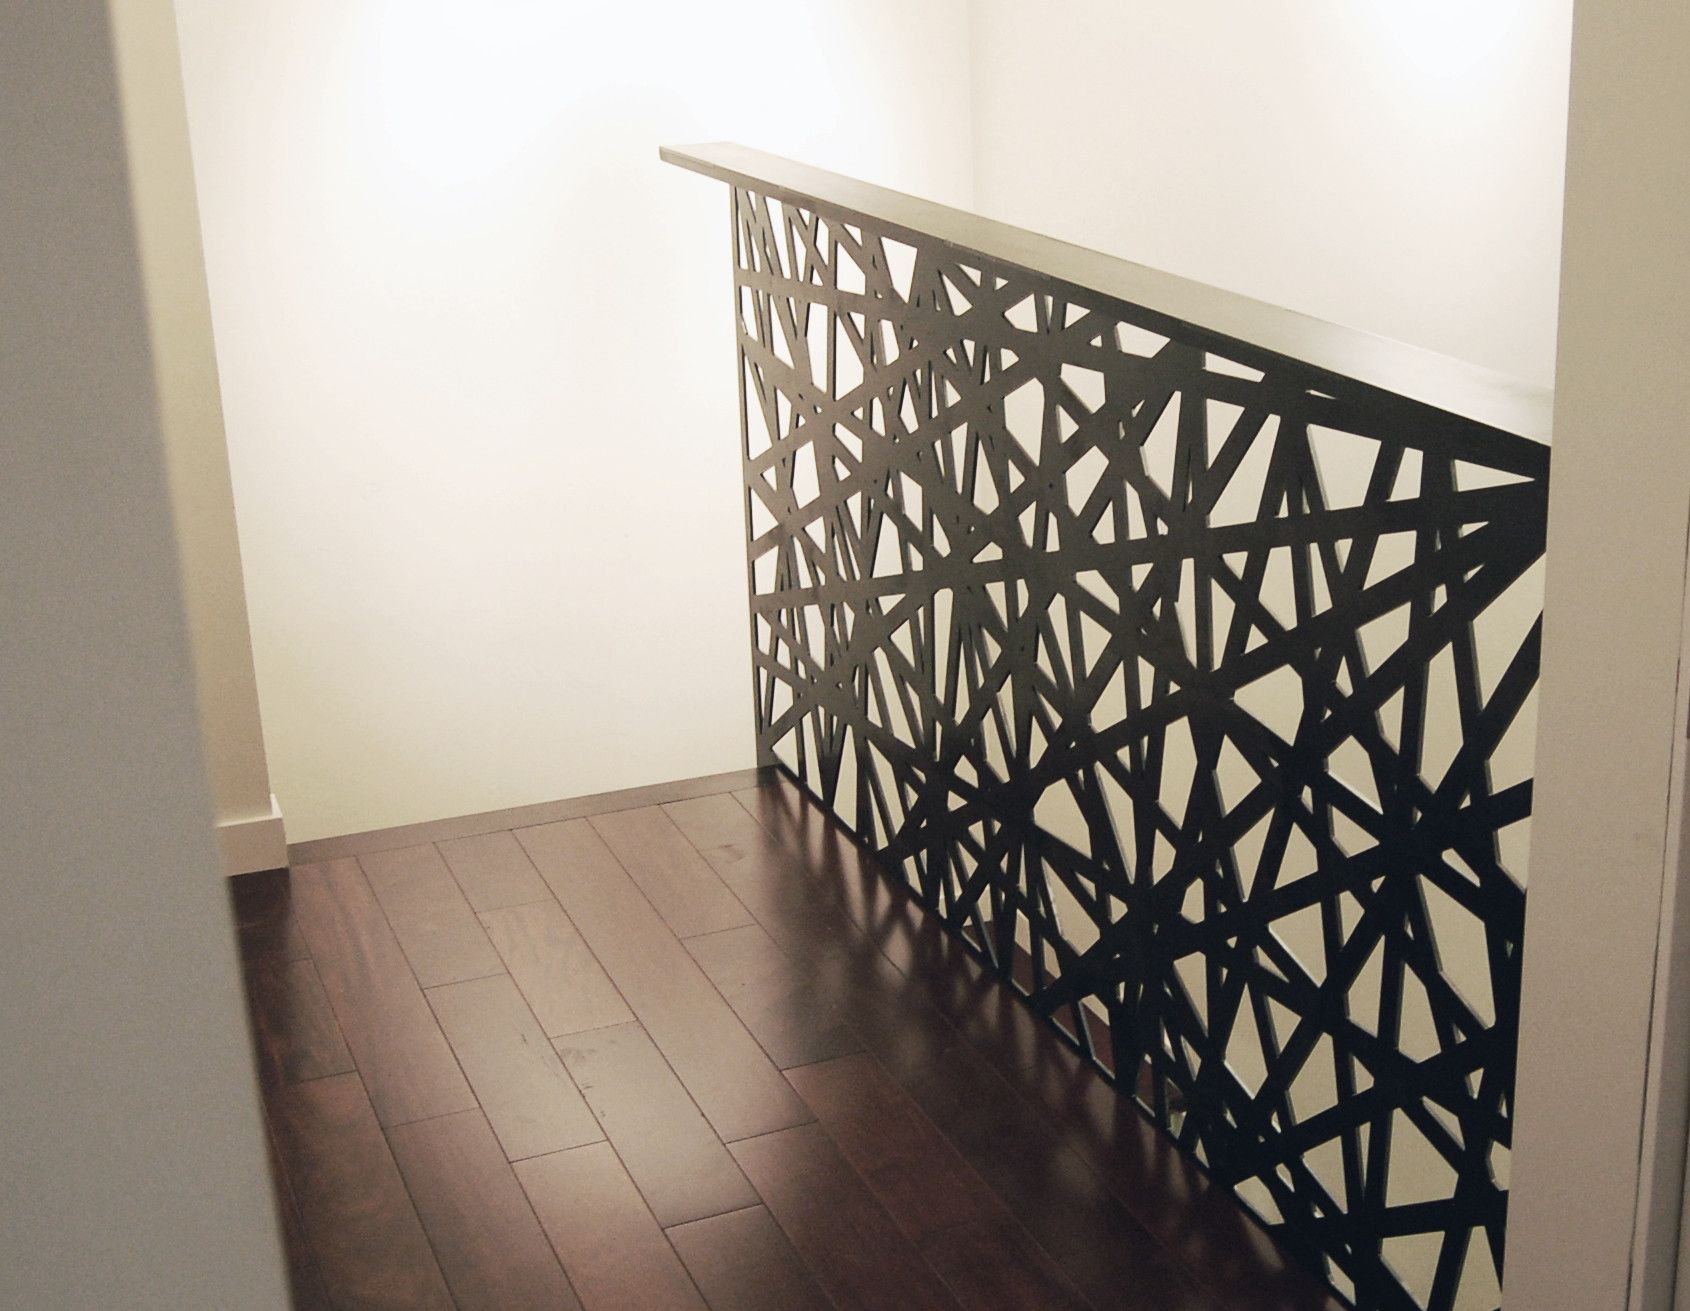 garde corps acier feuille acier pliage d coupe laser. Black Bedroom Furniture Sets. Home Design Ideas